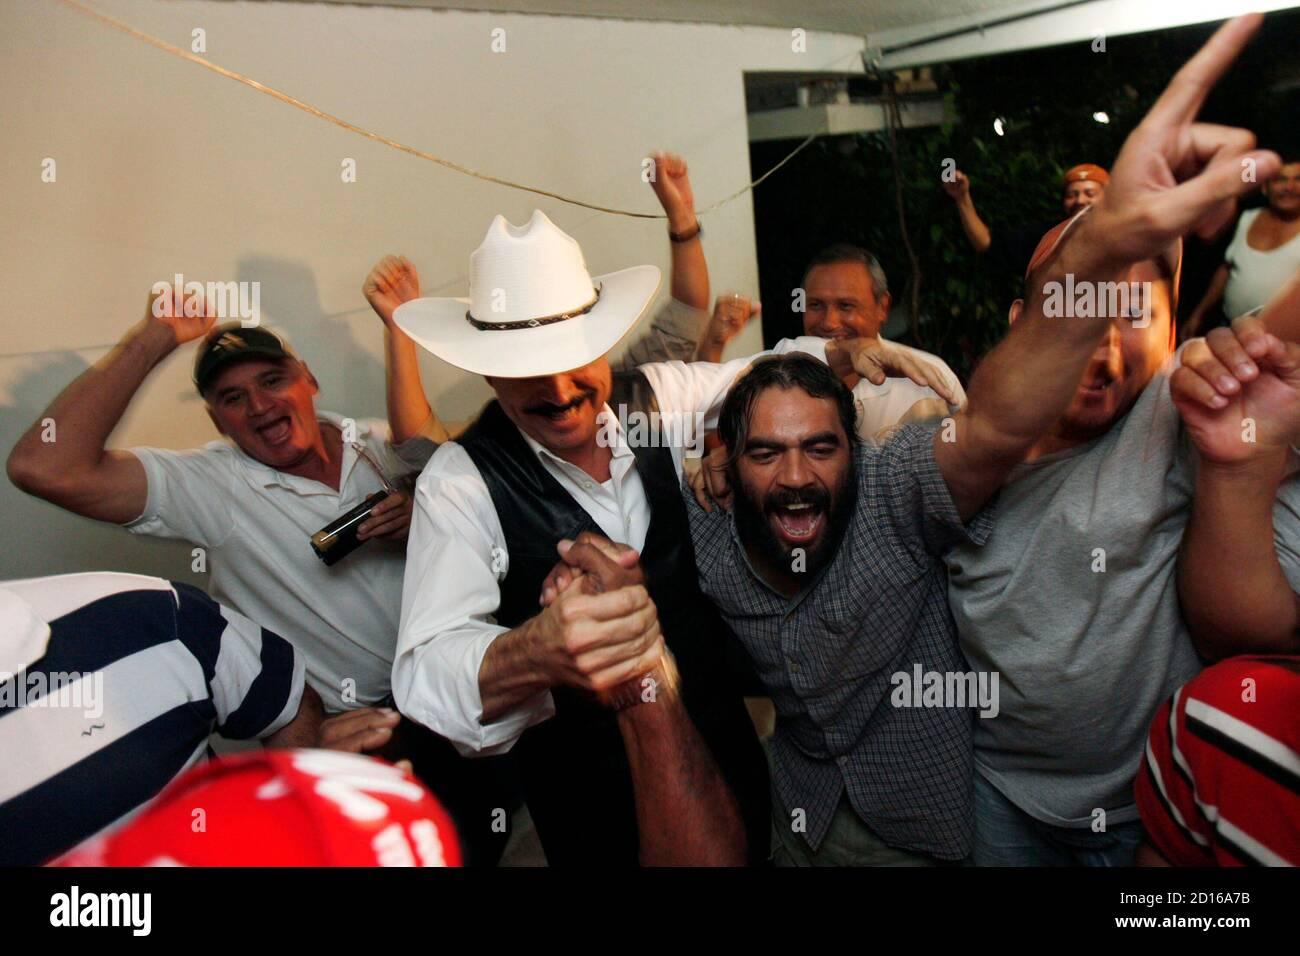 Ousted Honduras' President Manuel Zelaya (C) celebrates with supporters after Honduras' 2010 World Cup qualifying match victory over El Salvador, inside the Brazilian embassy in Tegucigalpa October 14, 2009. REUTERS/Edgard Garrido (HONDURAS POLITICS SPORT) Stock Photo